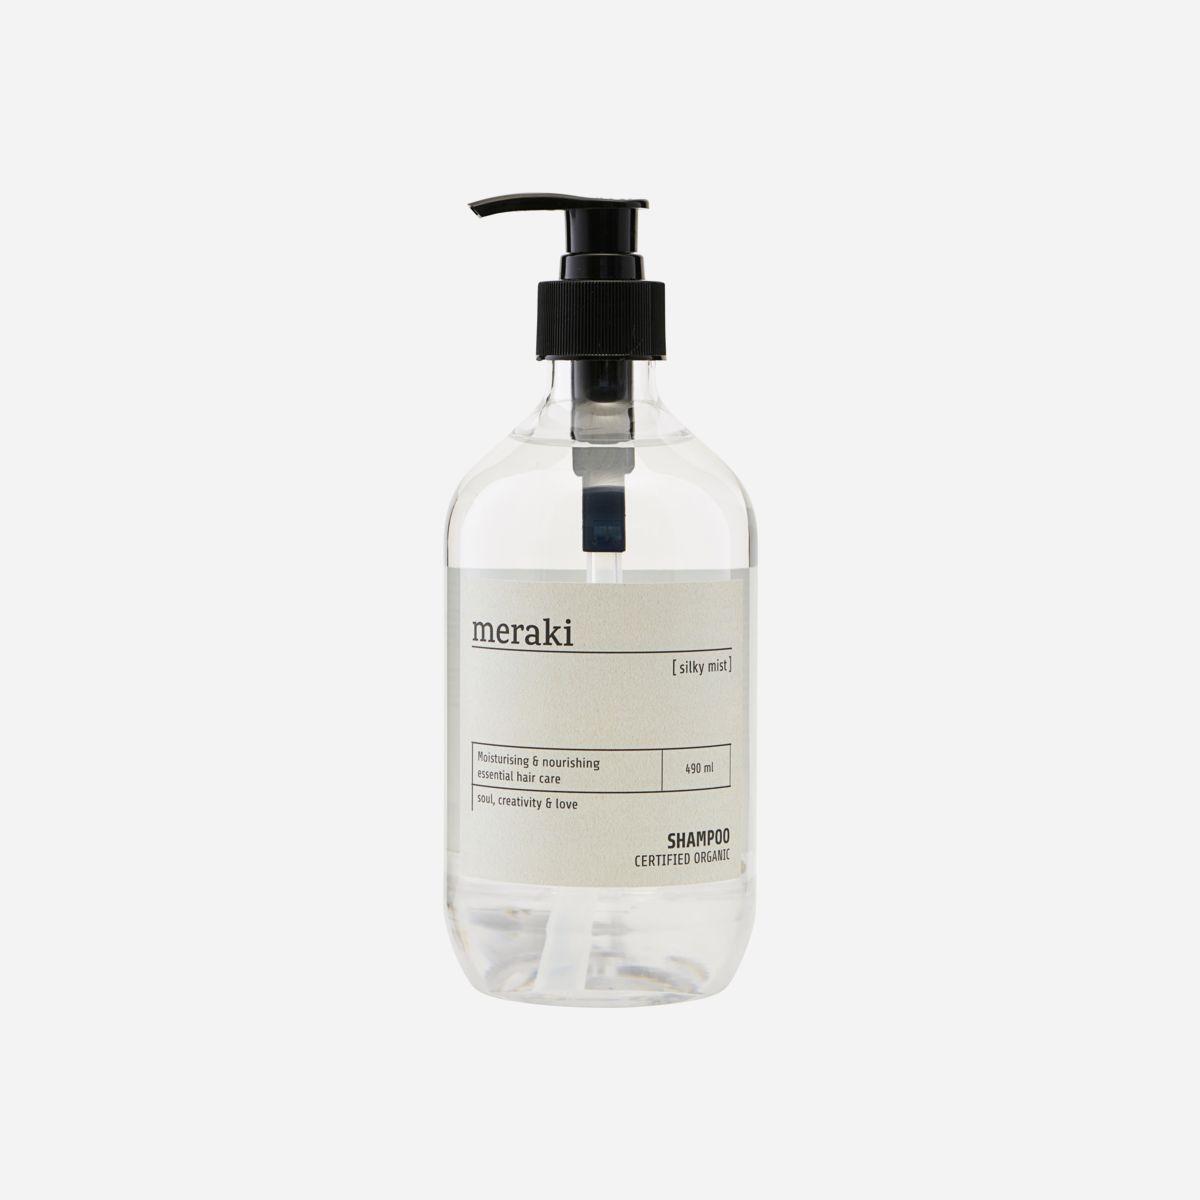 Meraki shampoo Silky mist